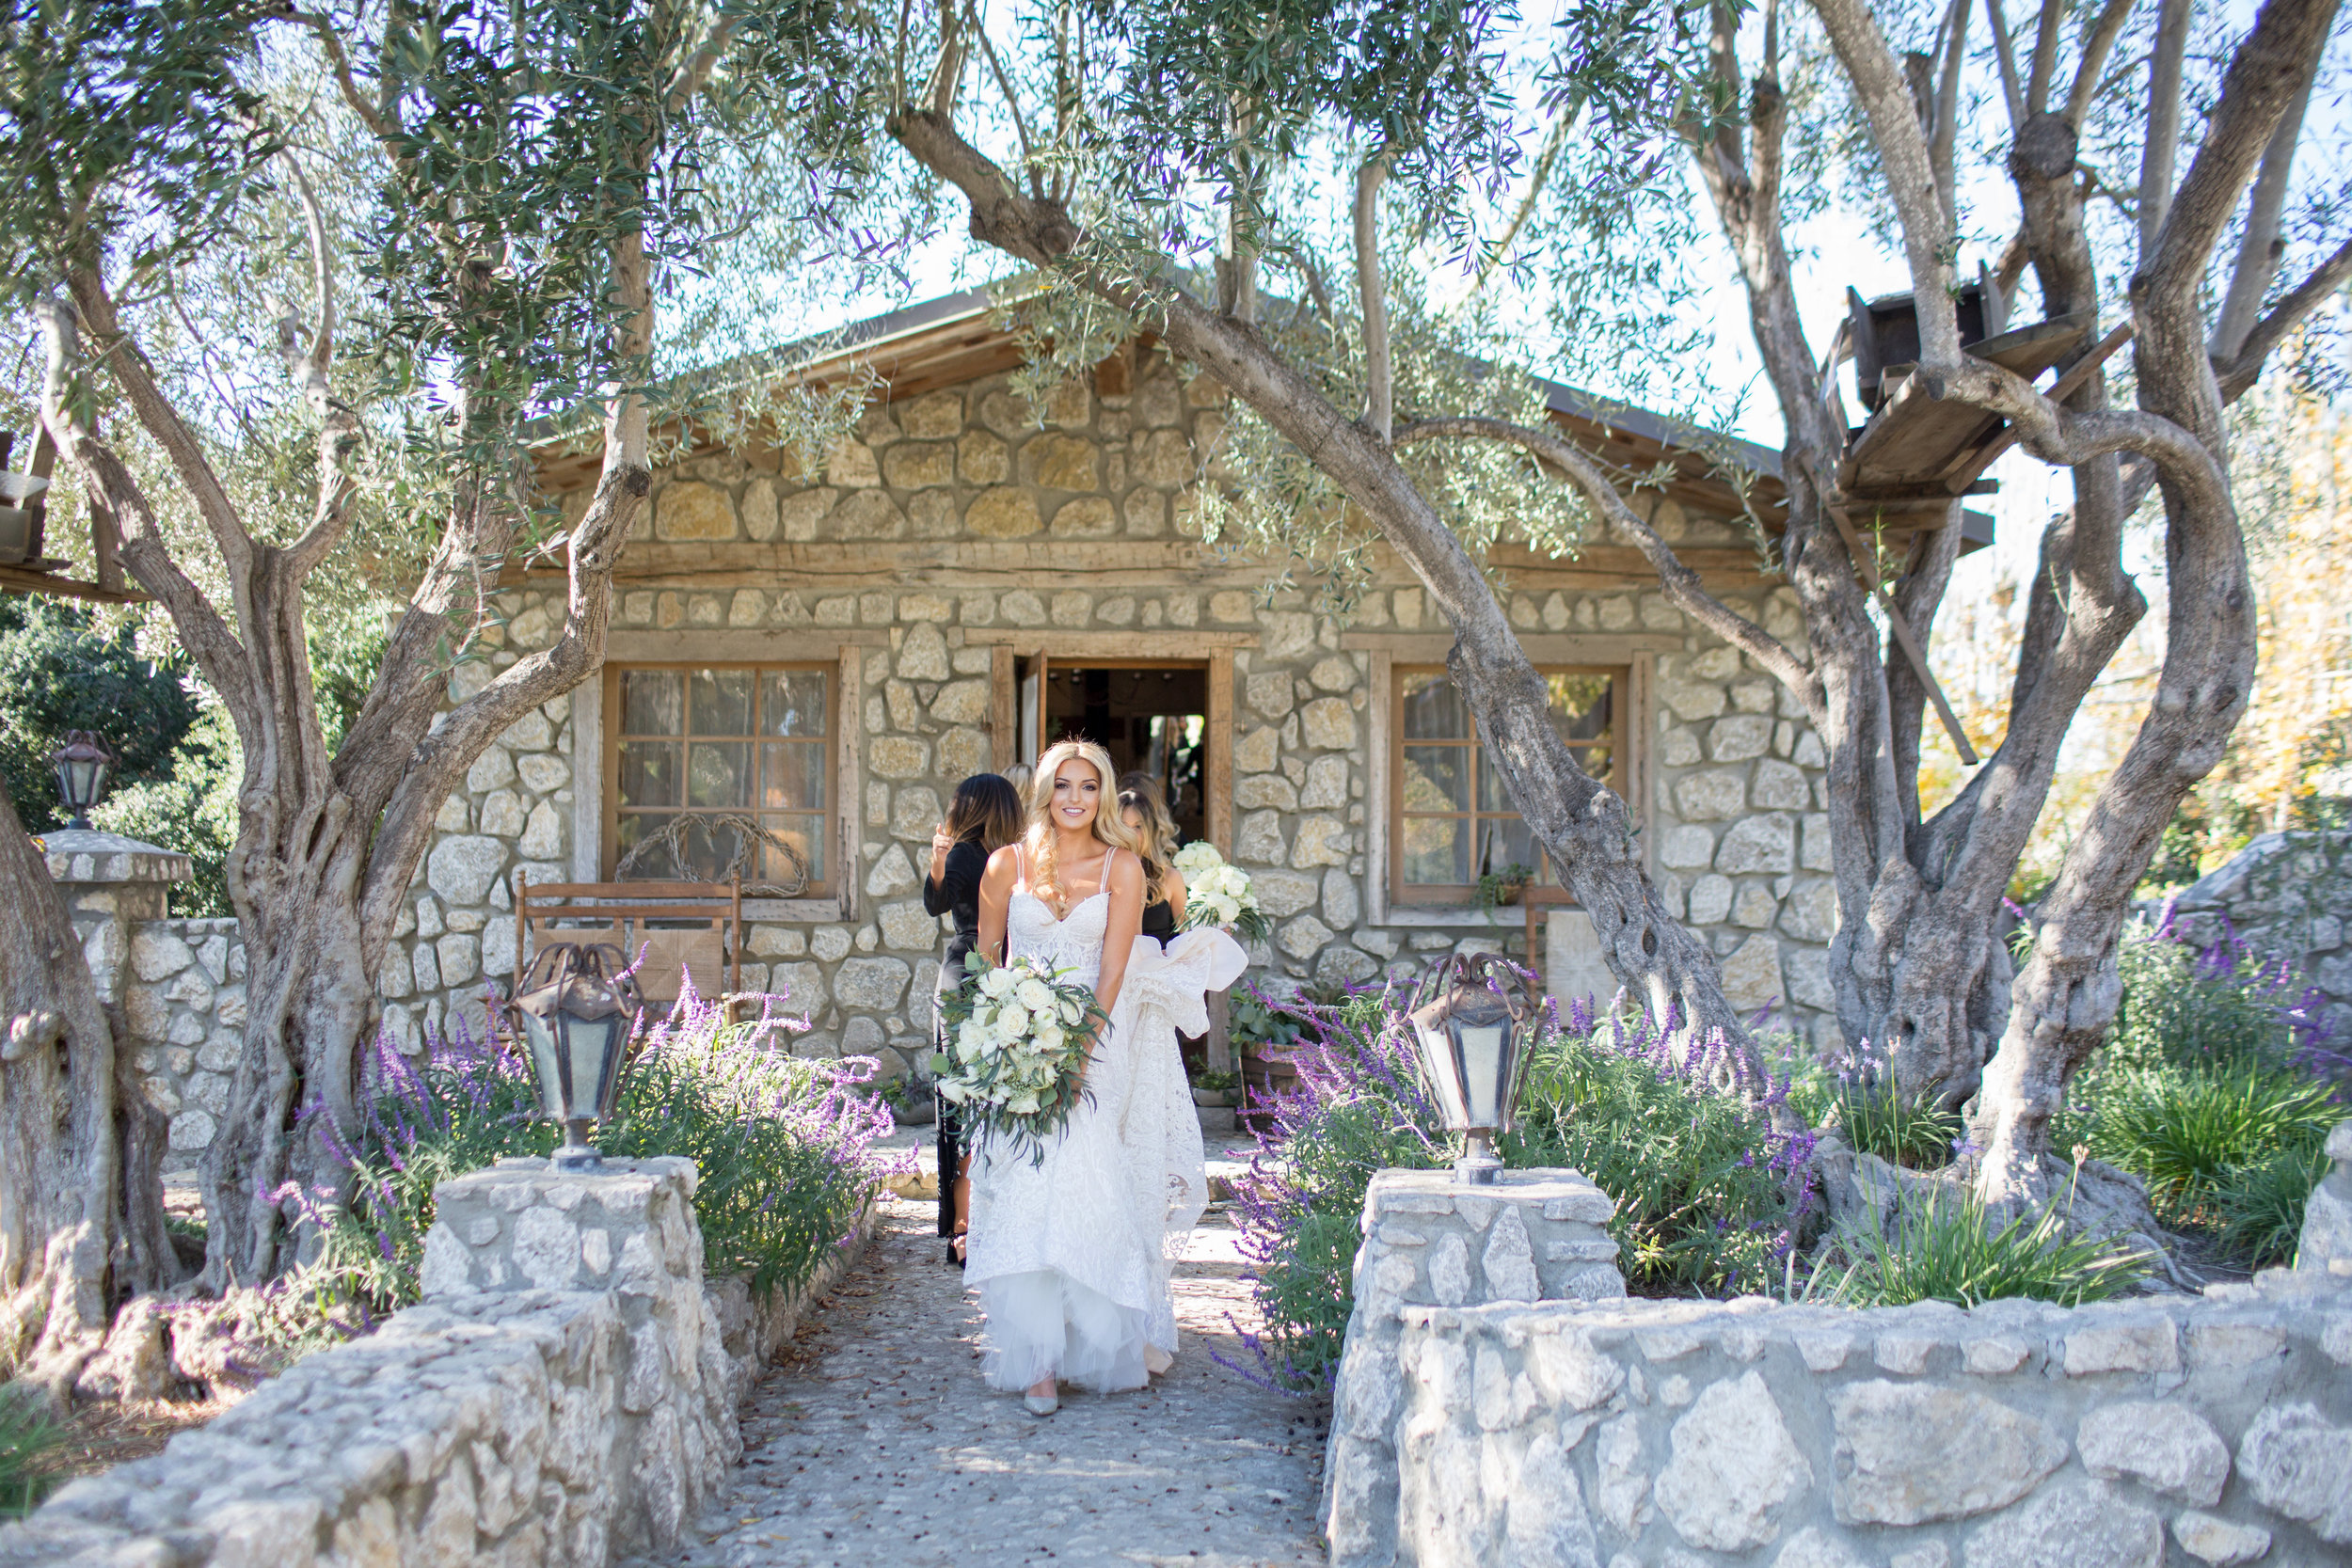 www.santabarbarawedding.com   Whispering Rose Ranch   Ann Johnson Events   Anna J Photo   Bride Leaving for Ceremony